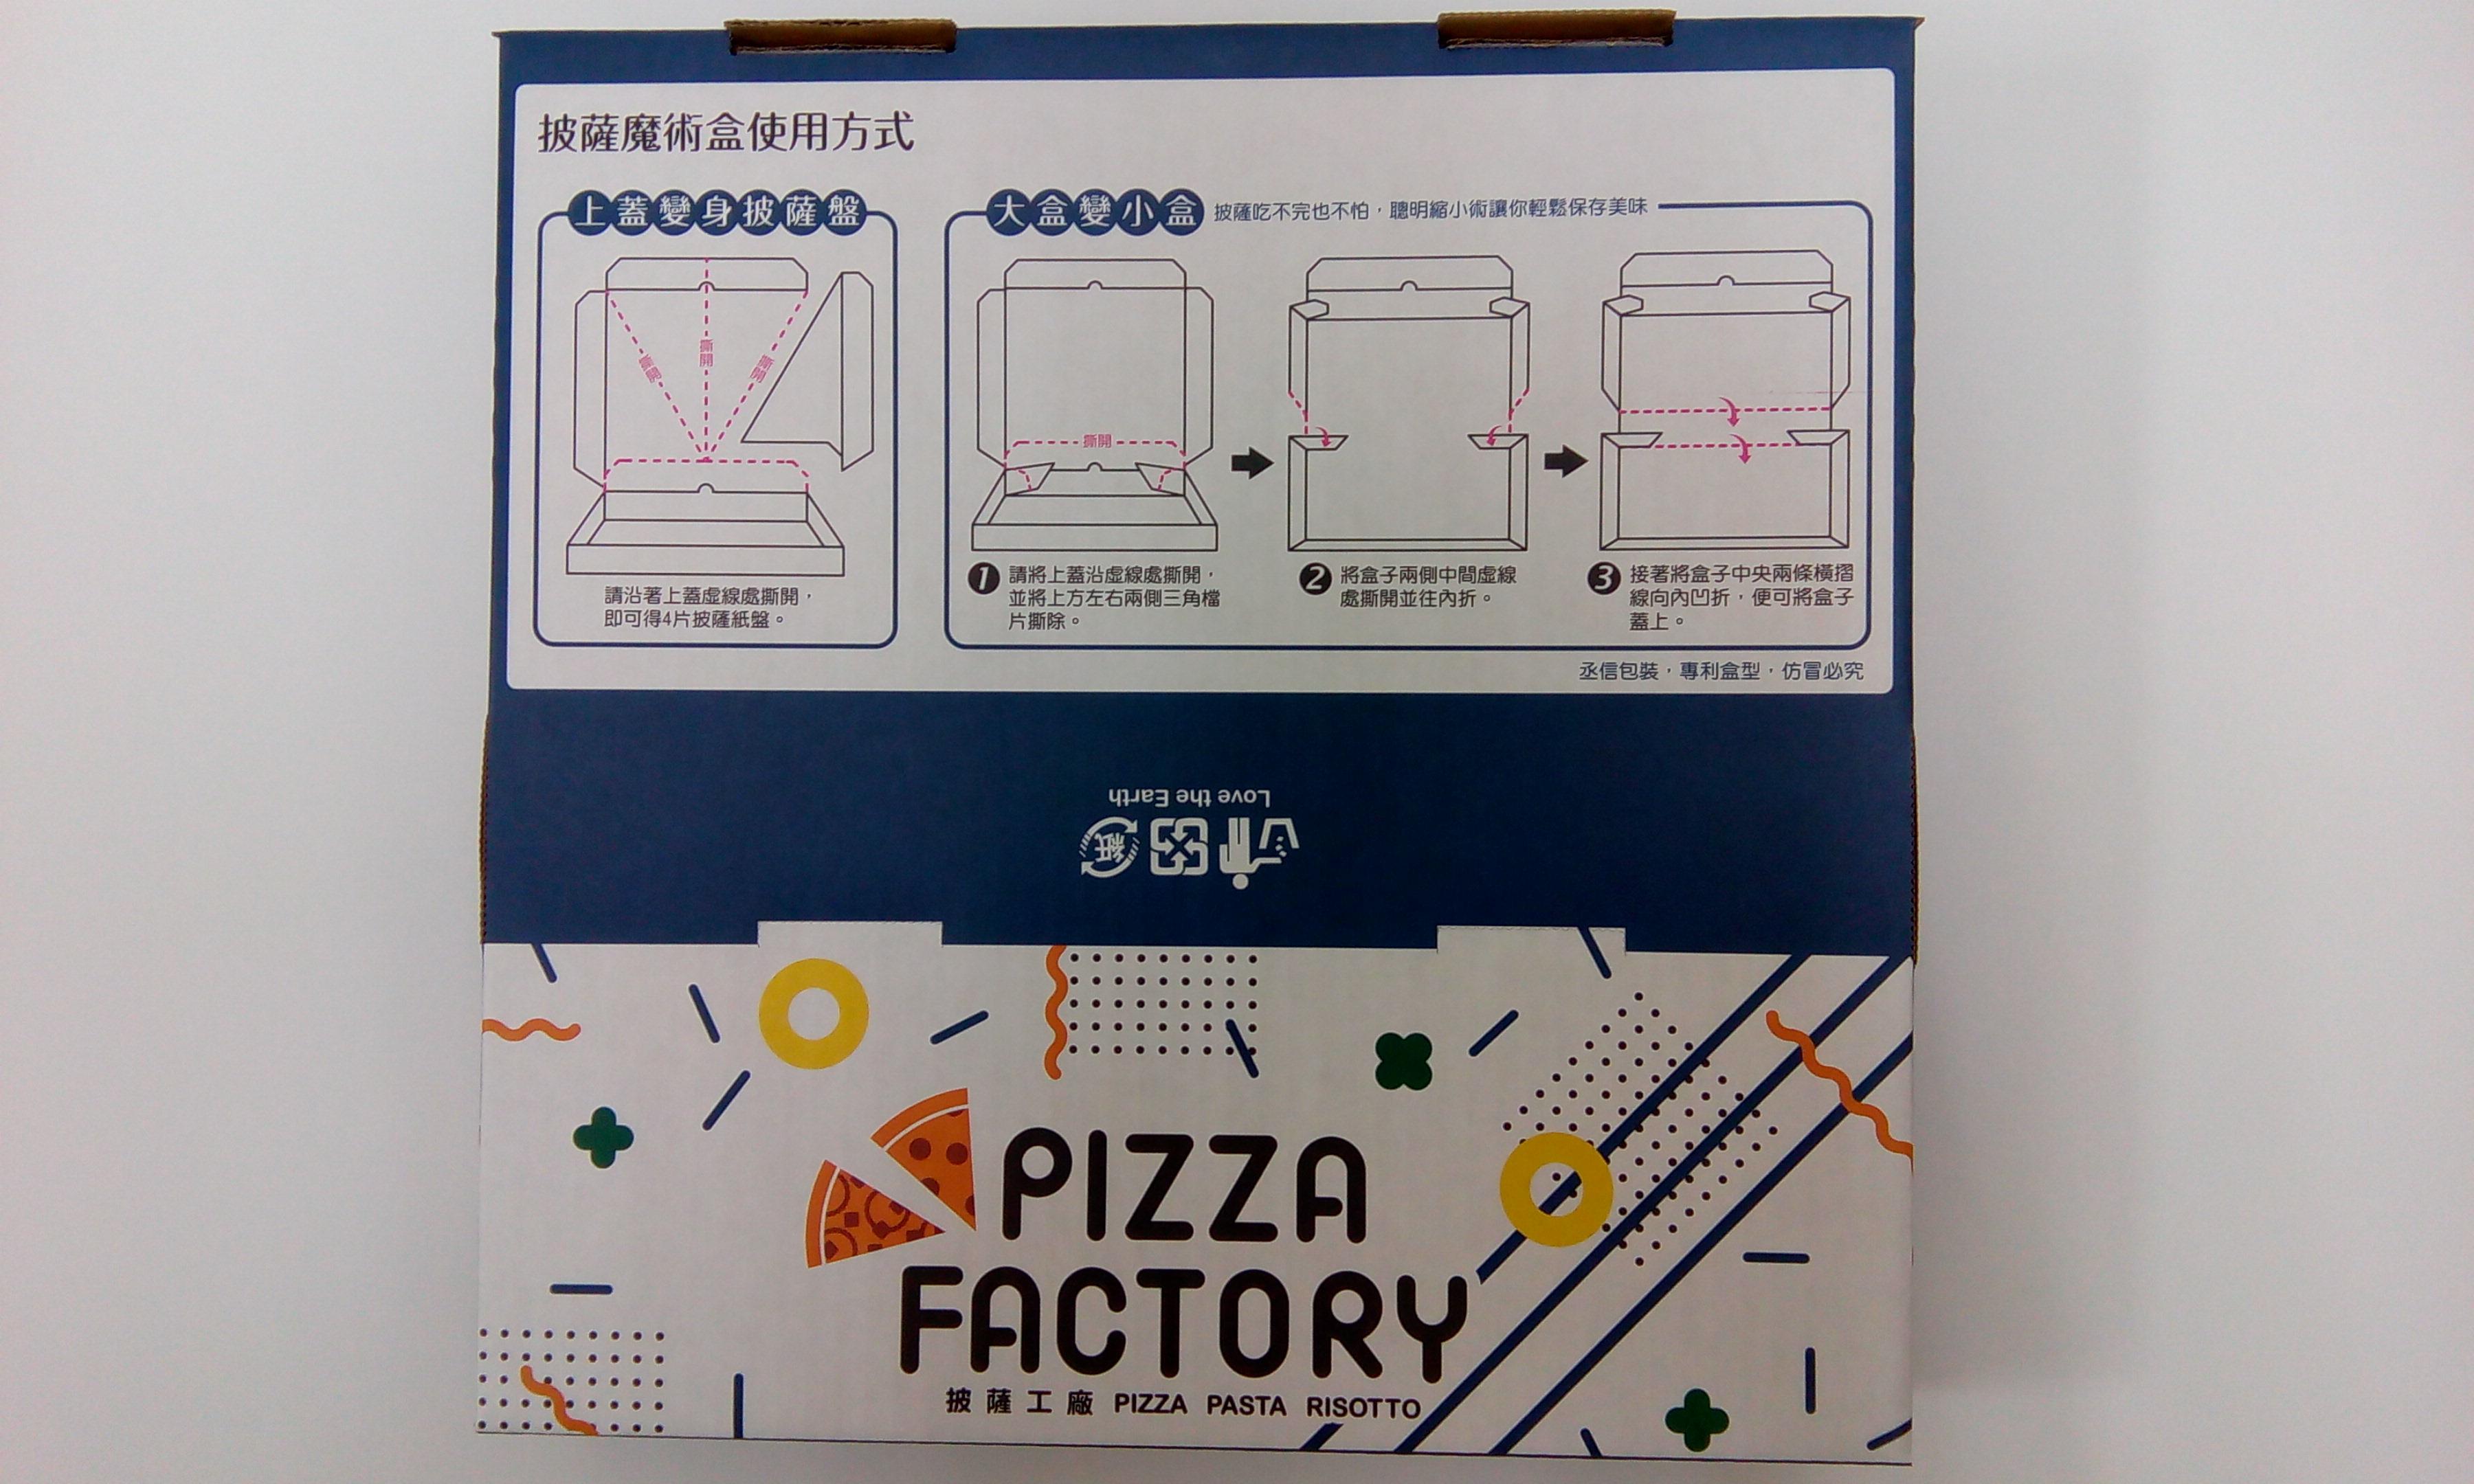 12吋 Pizza 魔術盒 反面